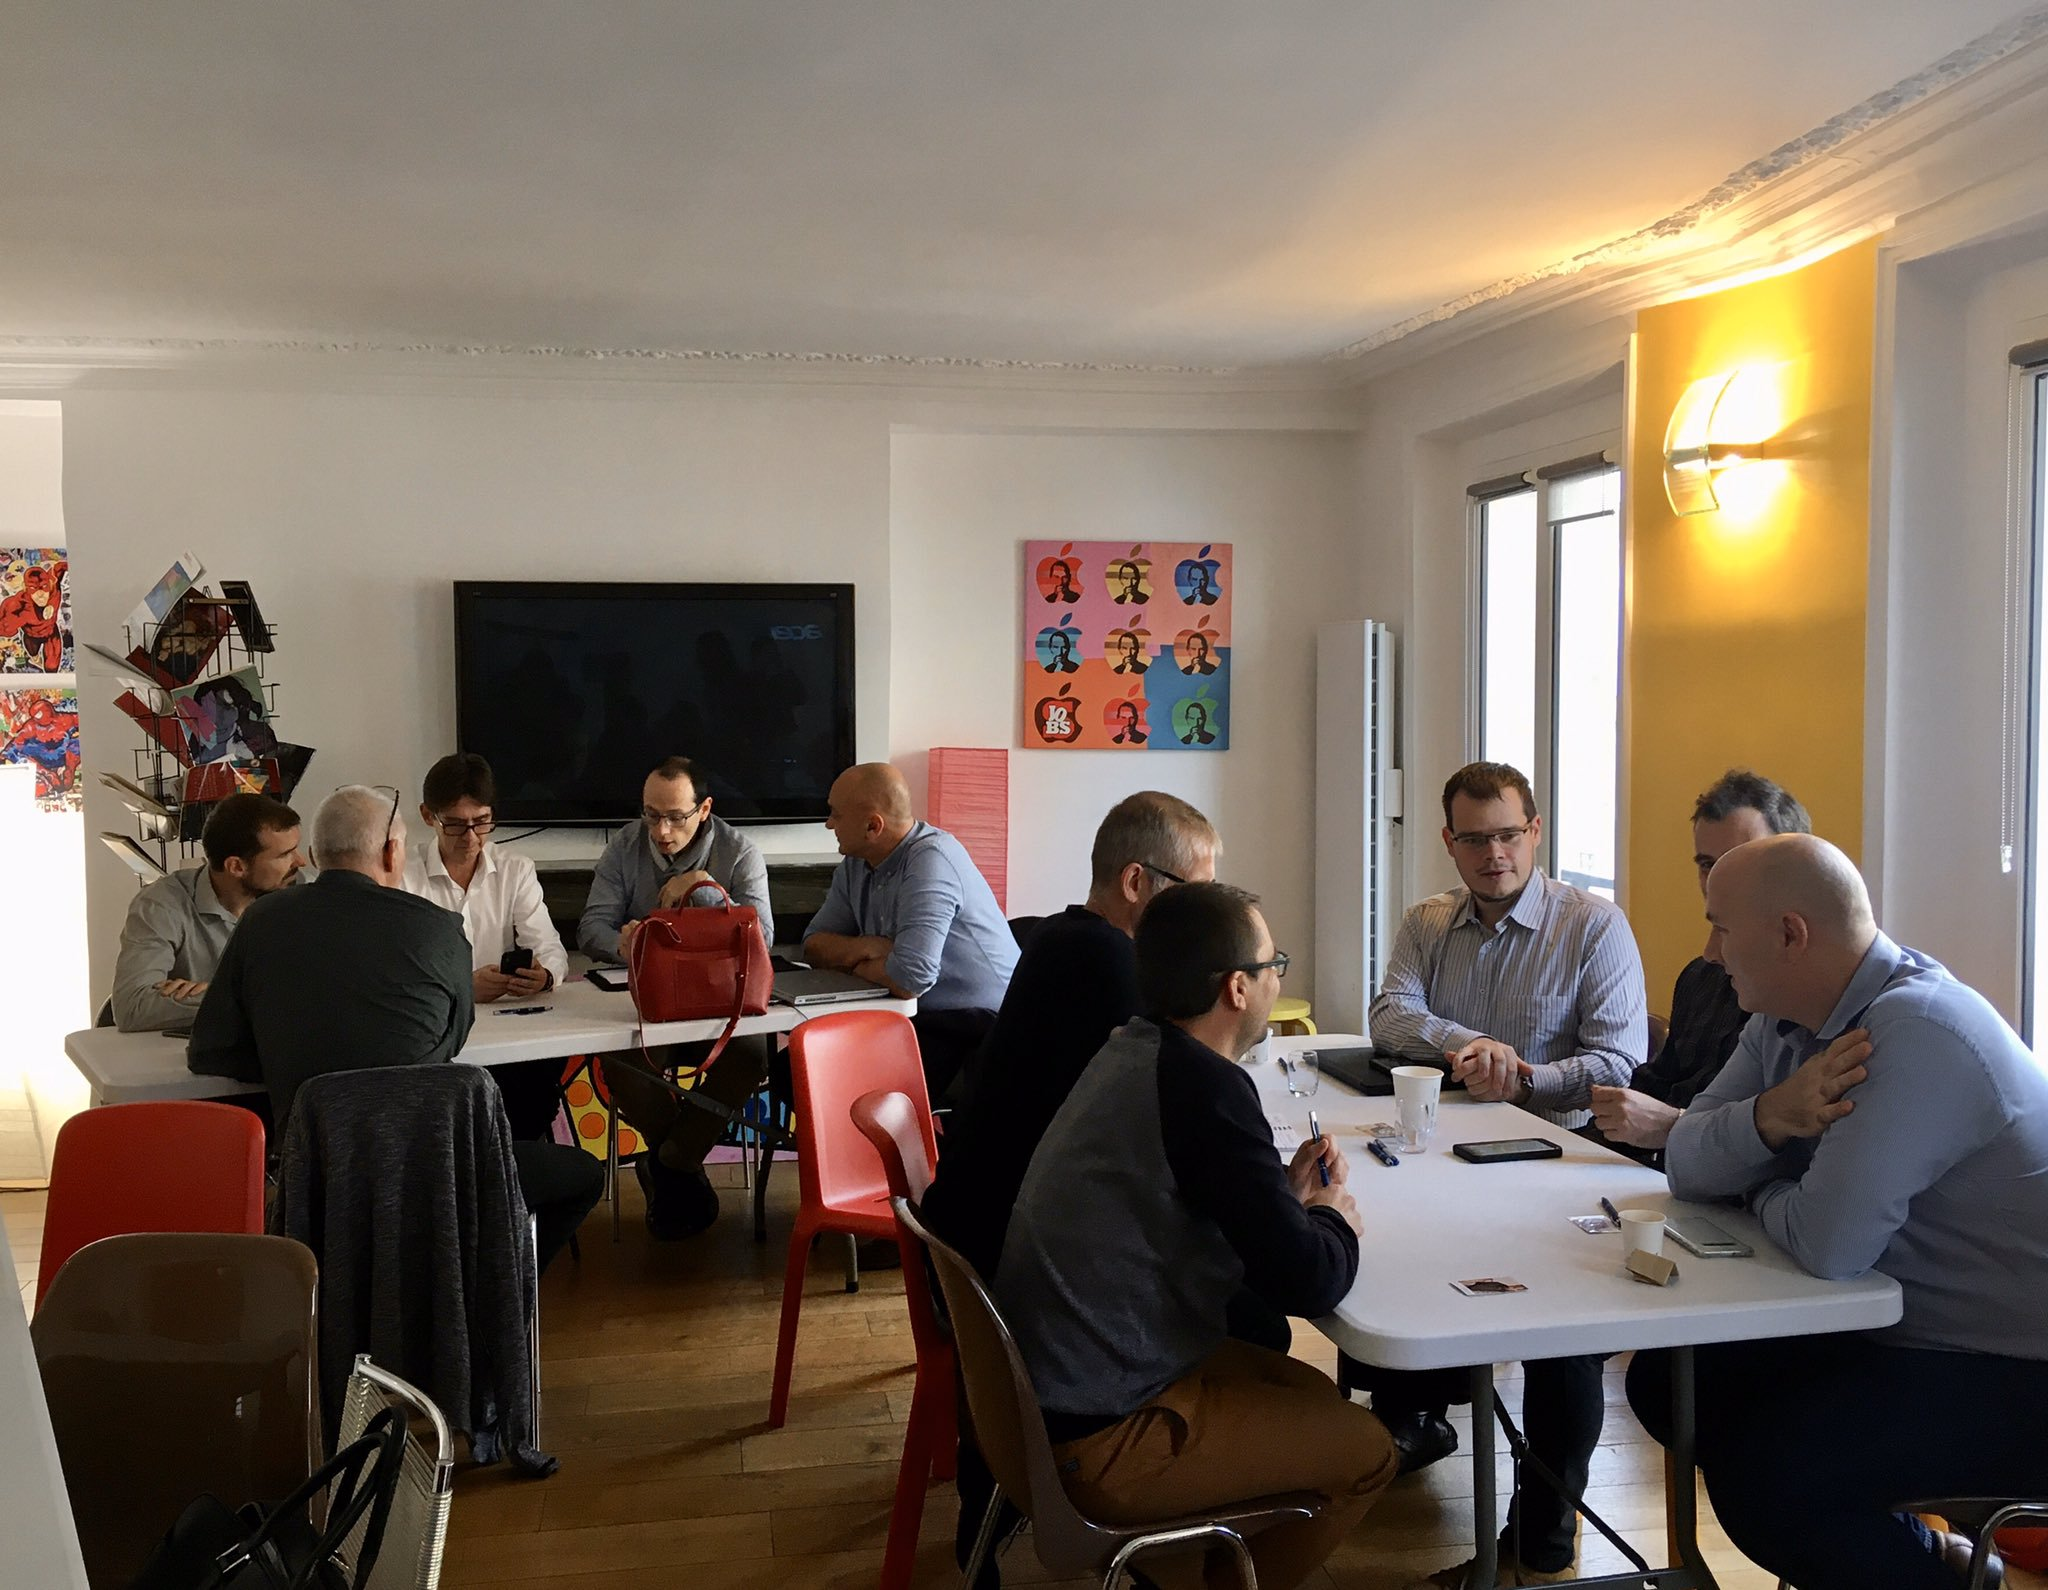 La Digital Academy by Aareon fête ses 1 an !